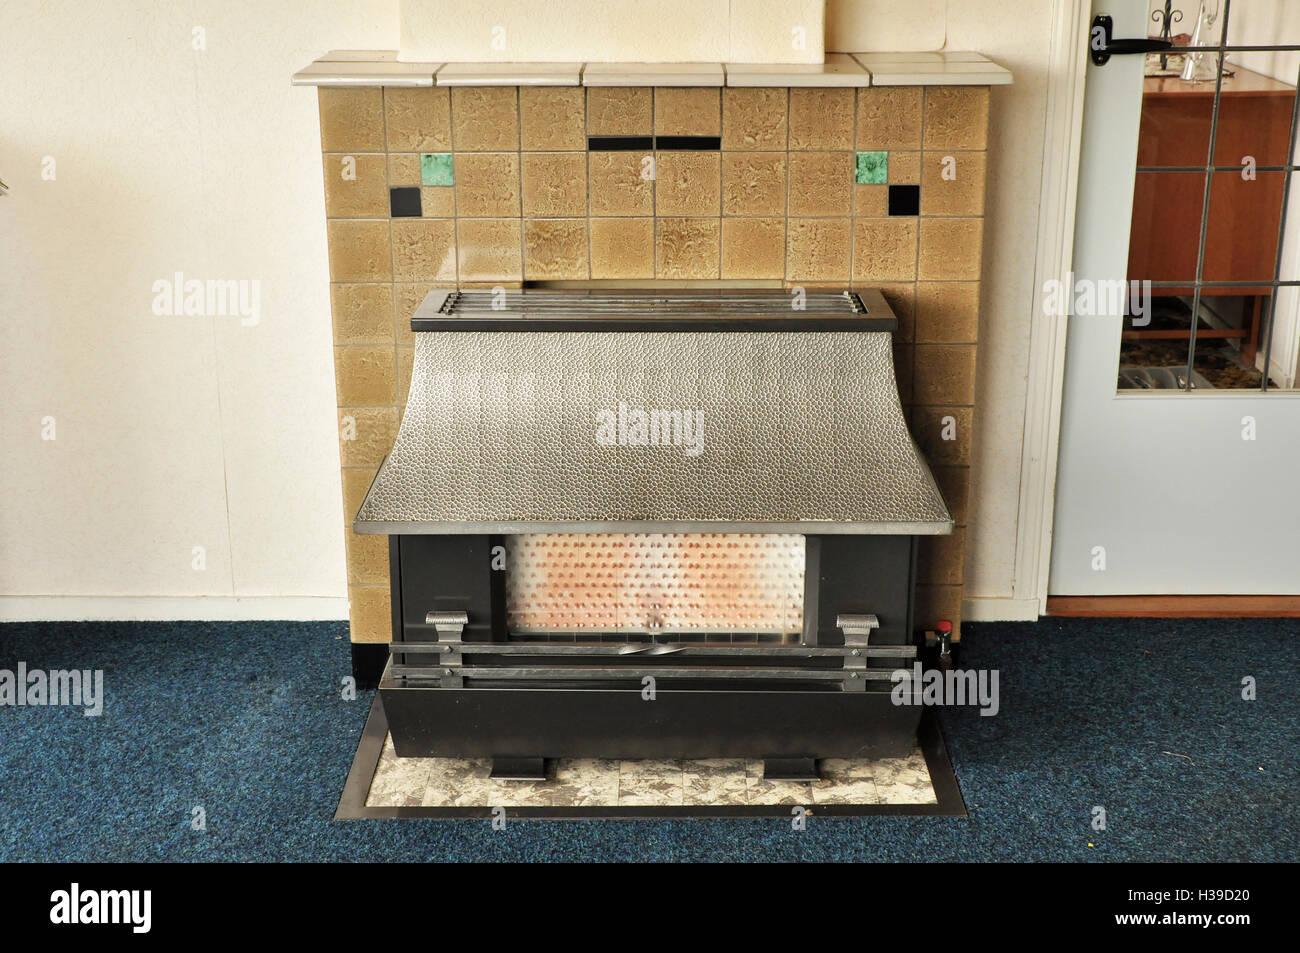 Dutch vintage interior stove - Stock Image